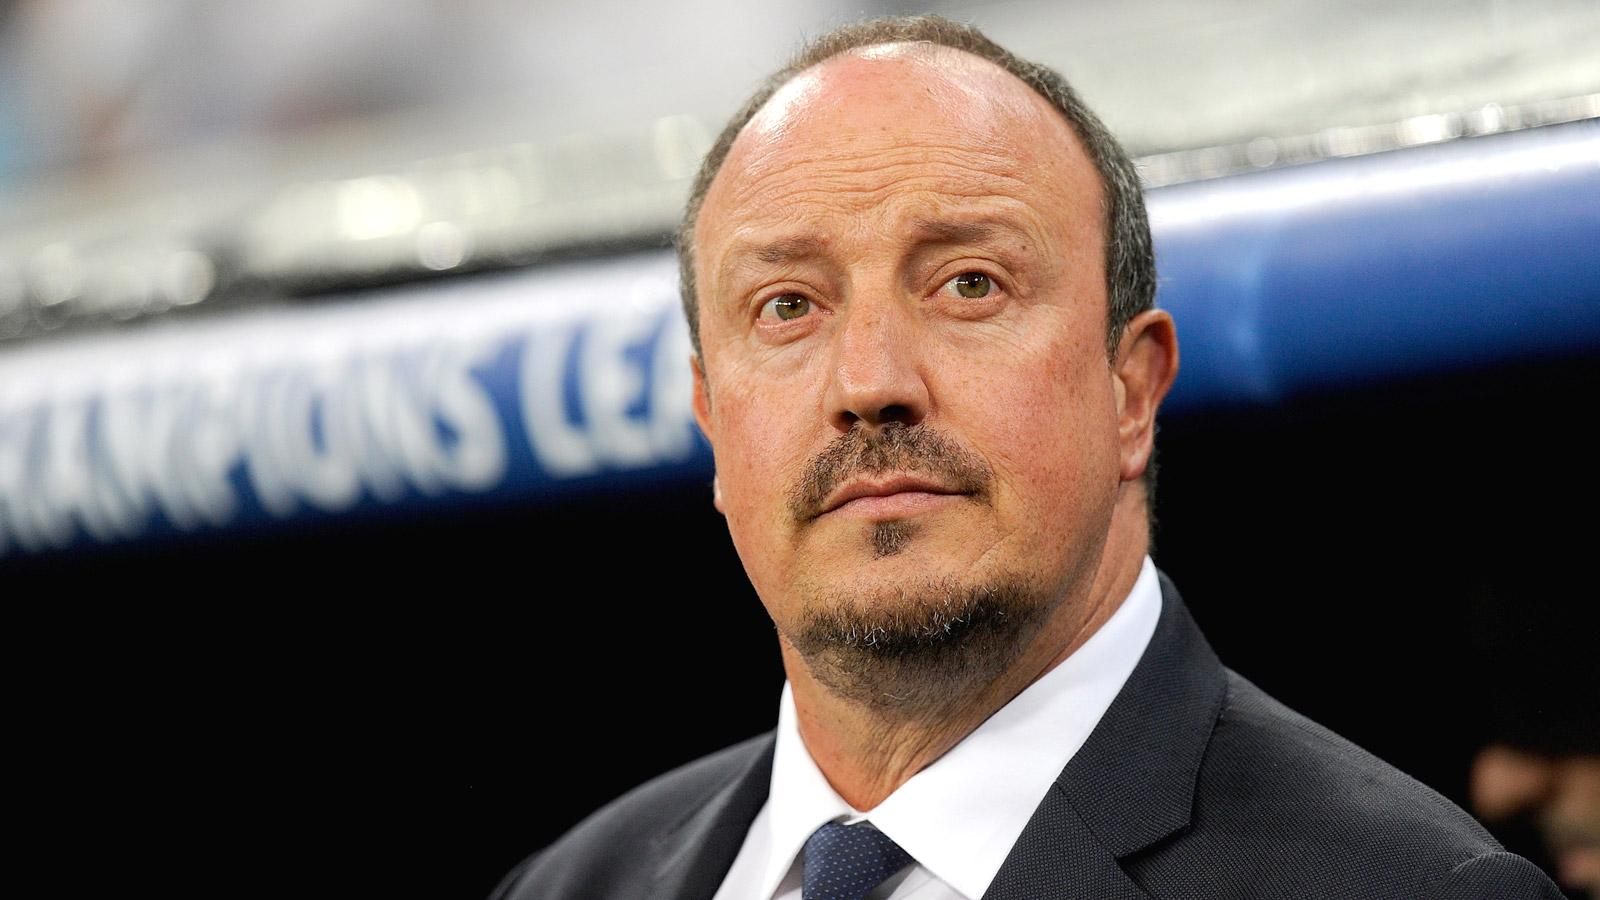 Benitez defends Real tactics after Madrid derby draw